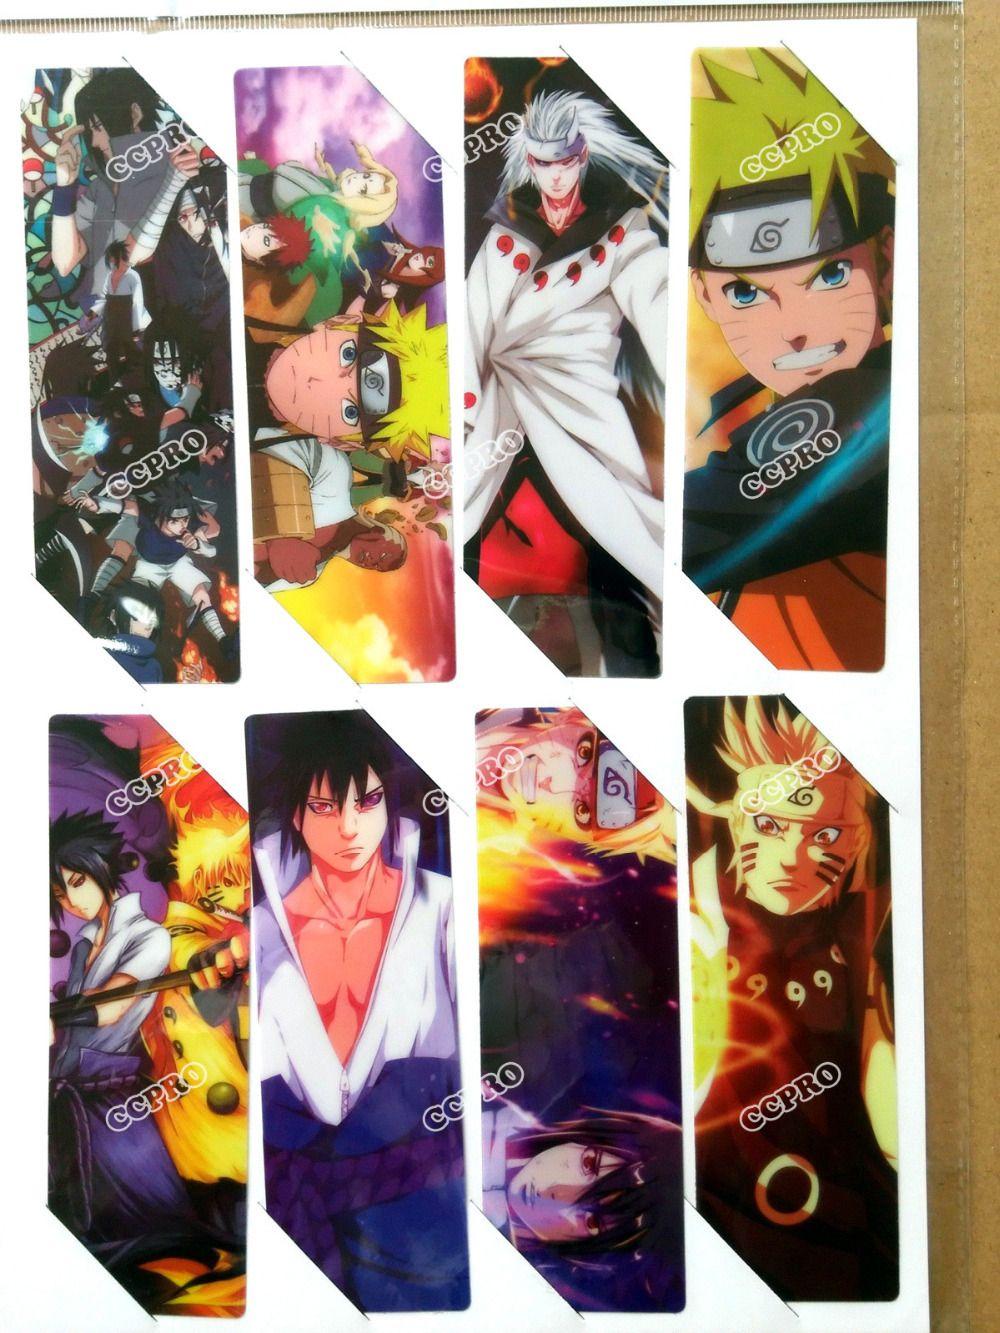 Merchandising & Fanartikel 8pcs/set PVC Lesezeichen Bookmarks of  Anime K project book mark